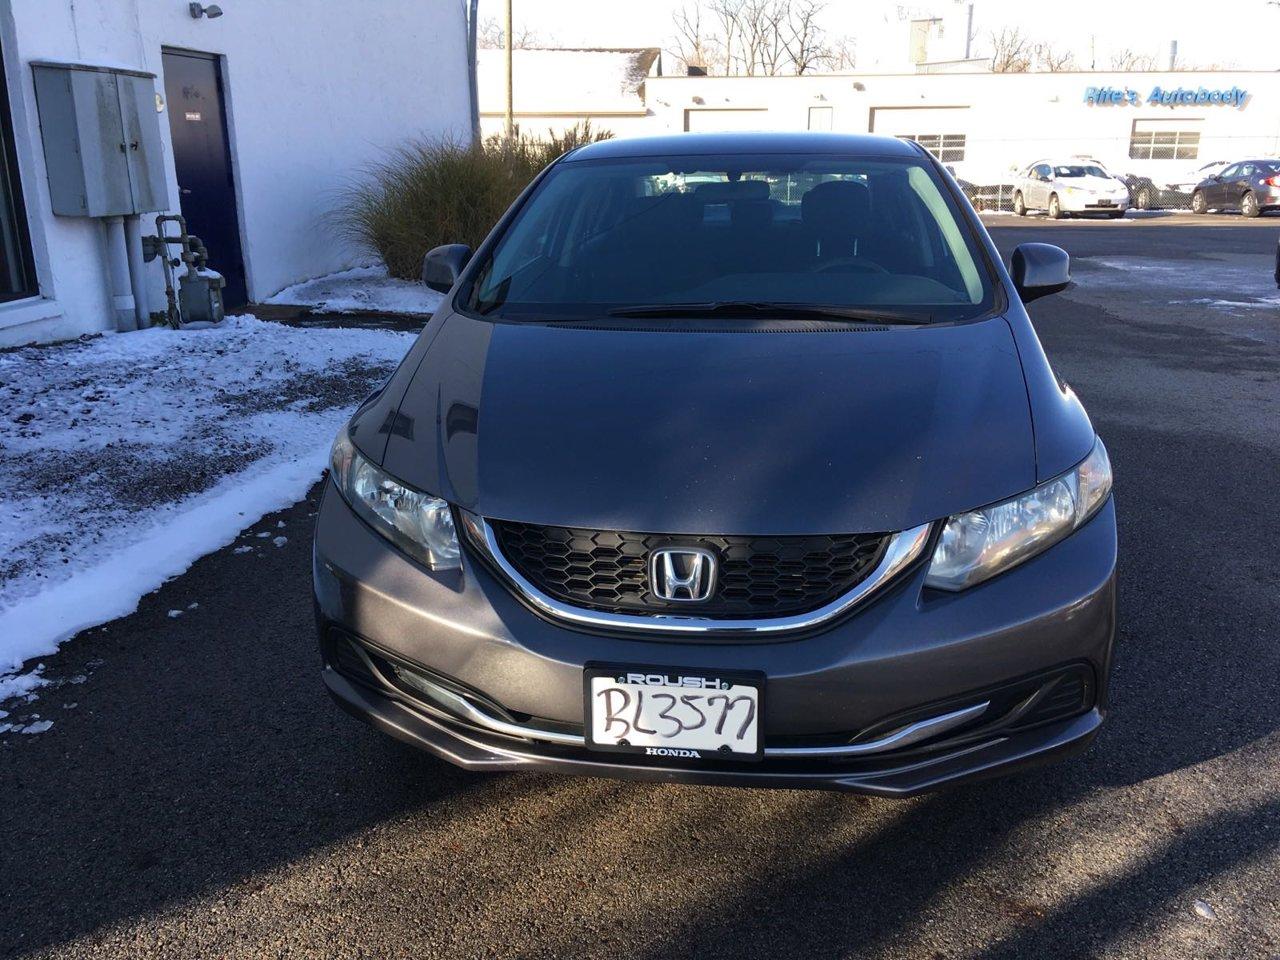 Used 2013 Honda Civic Sedan in Westerville, OH